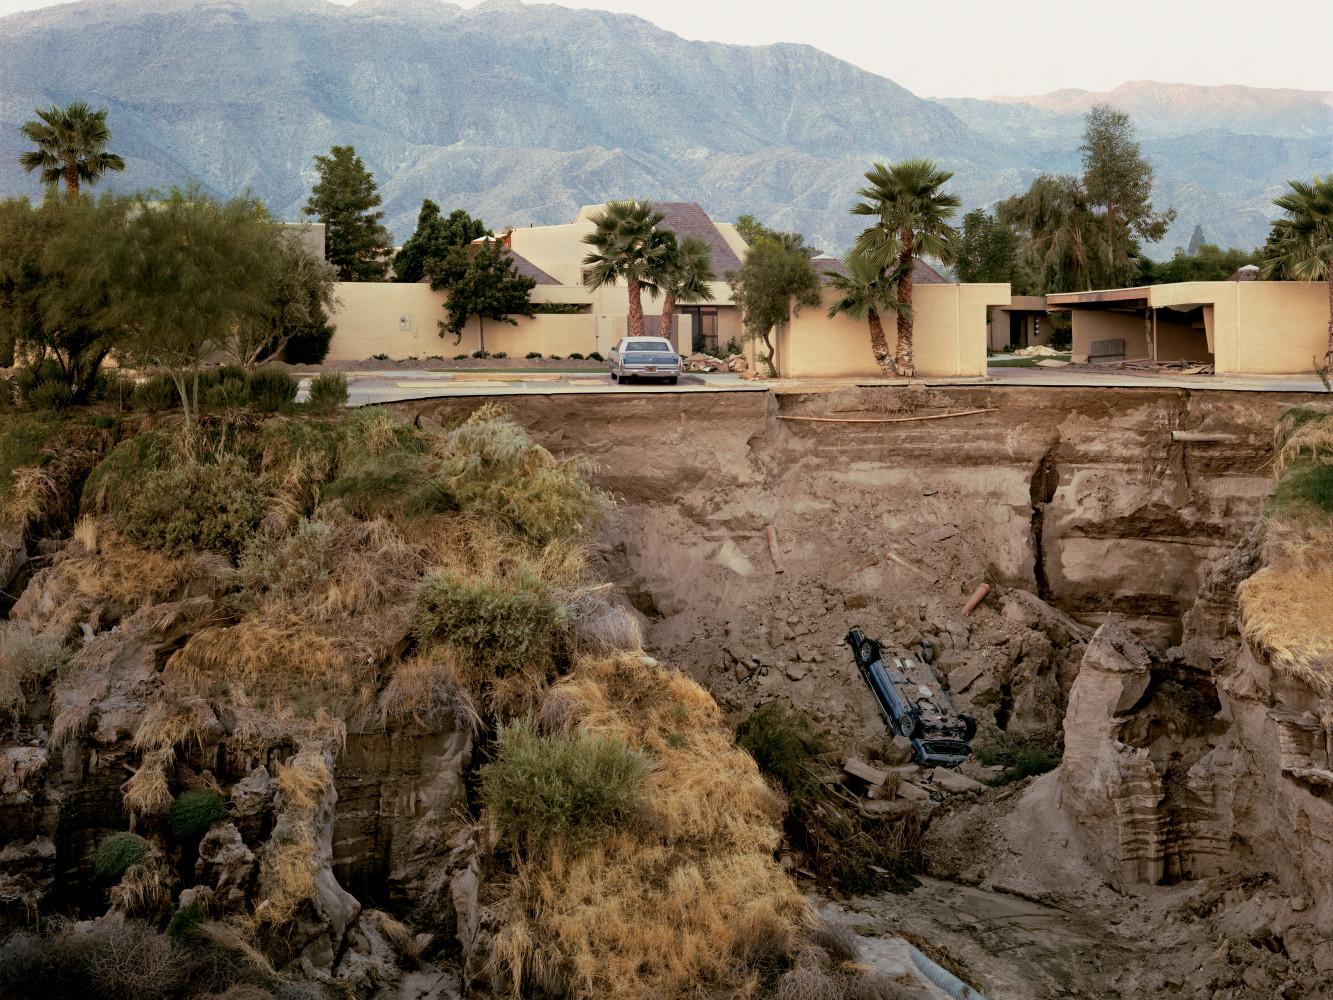 Joel Sternfeld, 'After a Flash Flood, Rancho Mirage, California, 1979', 1981